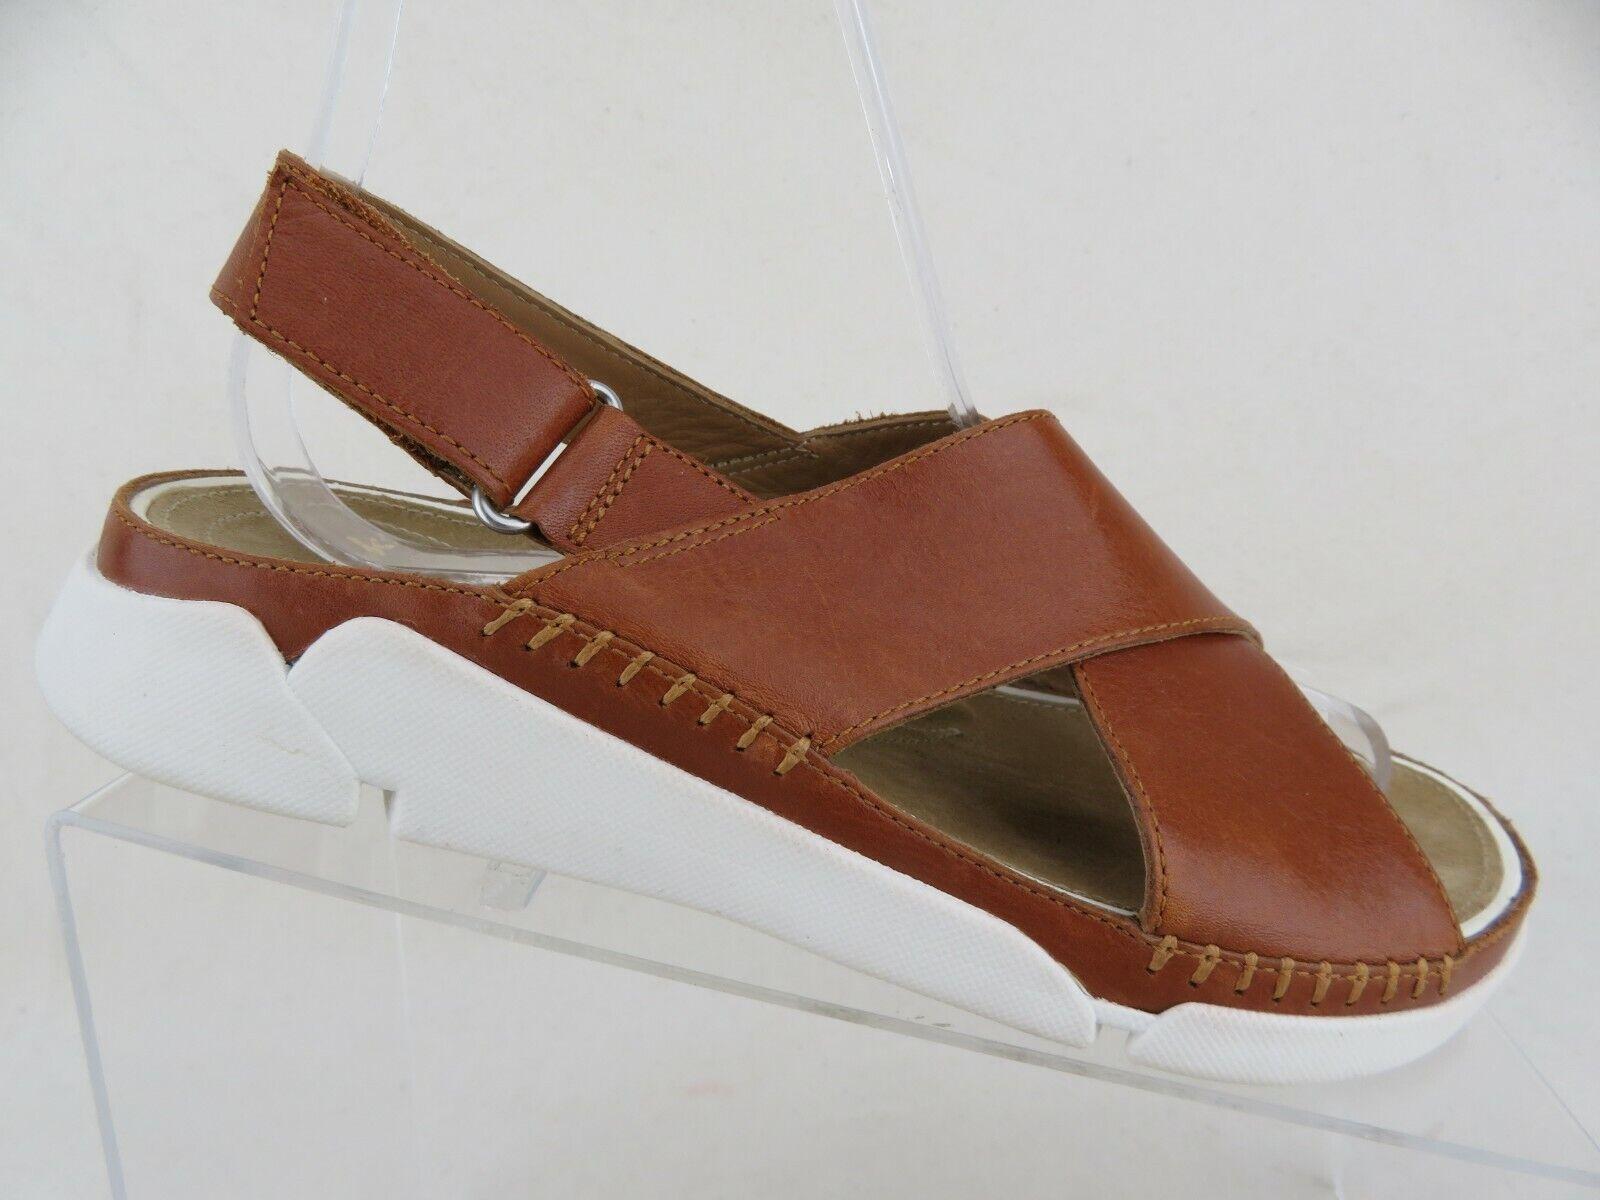 Clarks Artisan trigenic marron sz 6.5 M femmes Sandales en cuir